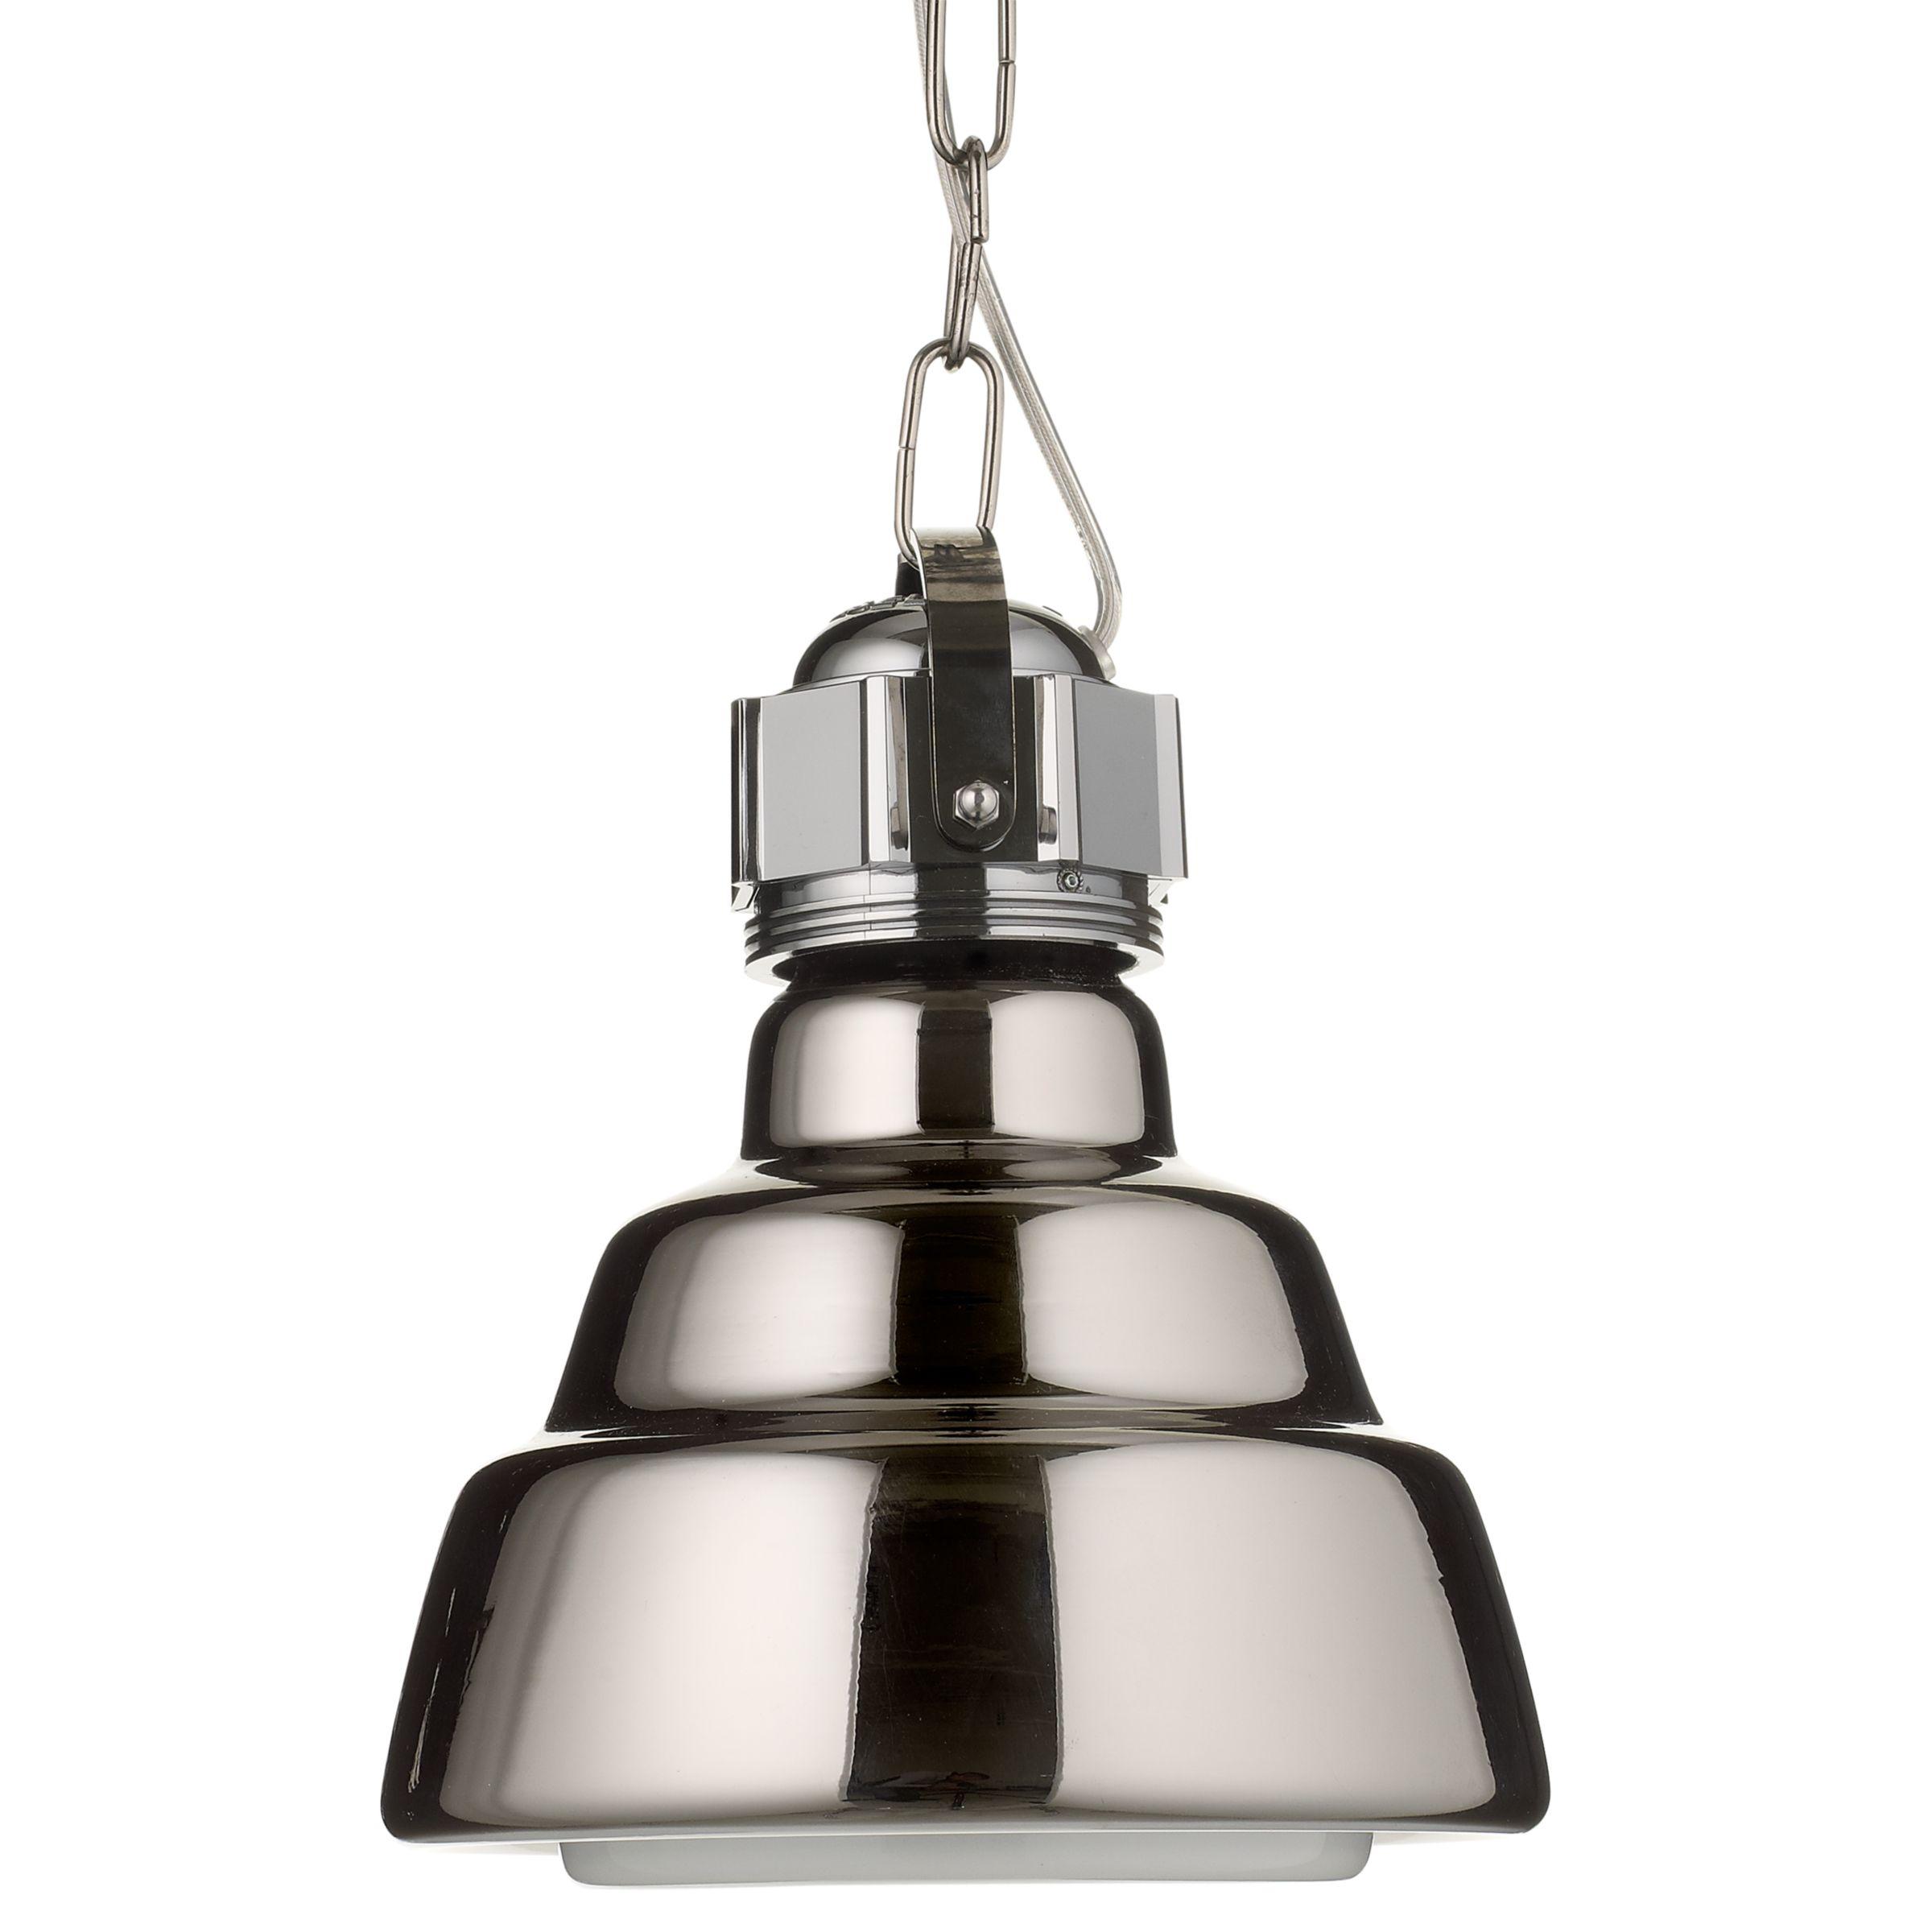 Diesel with Foscarini Glas Ceiling Light at John Lewis